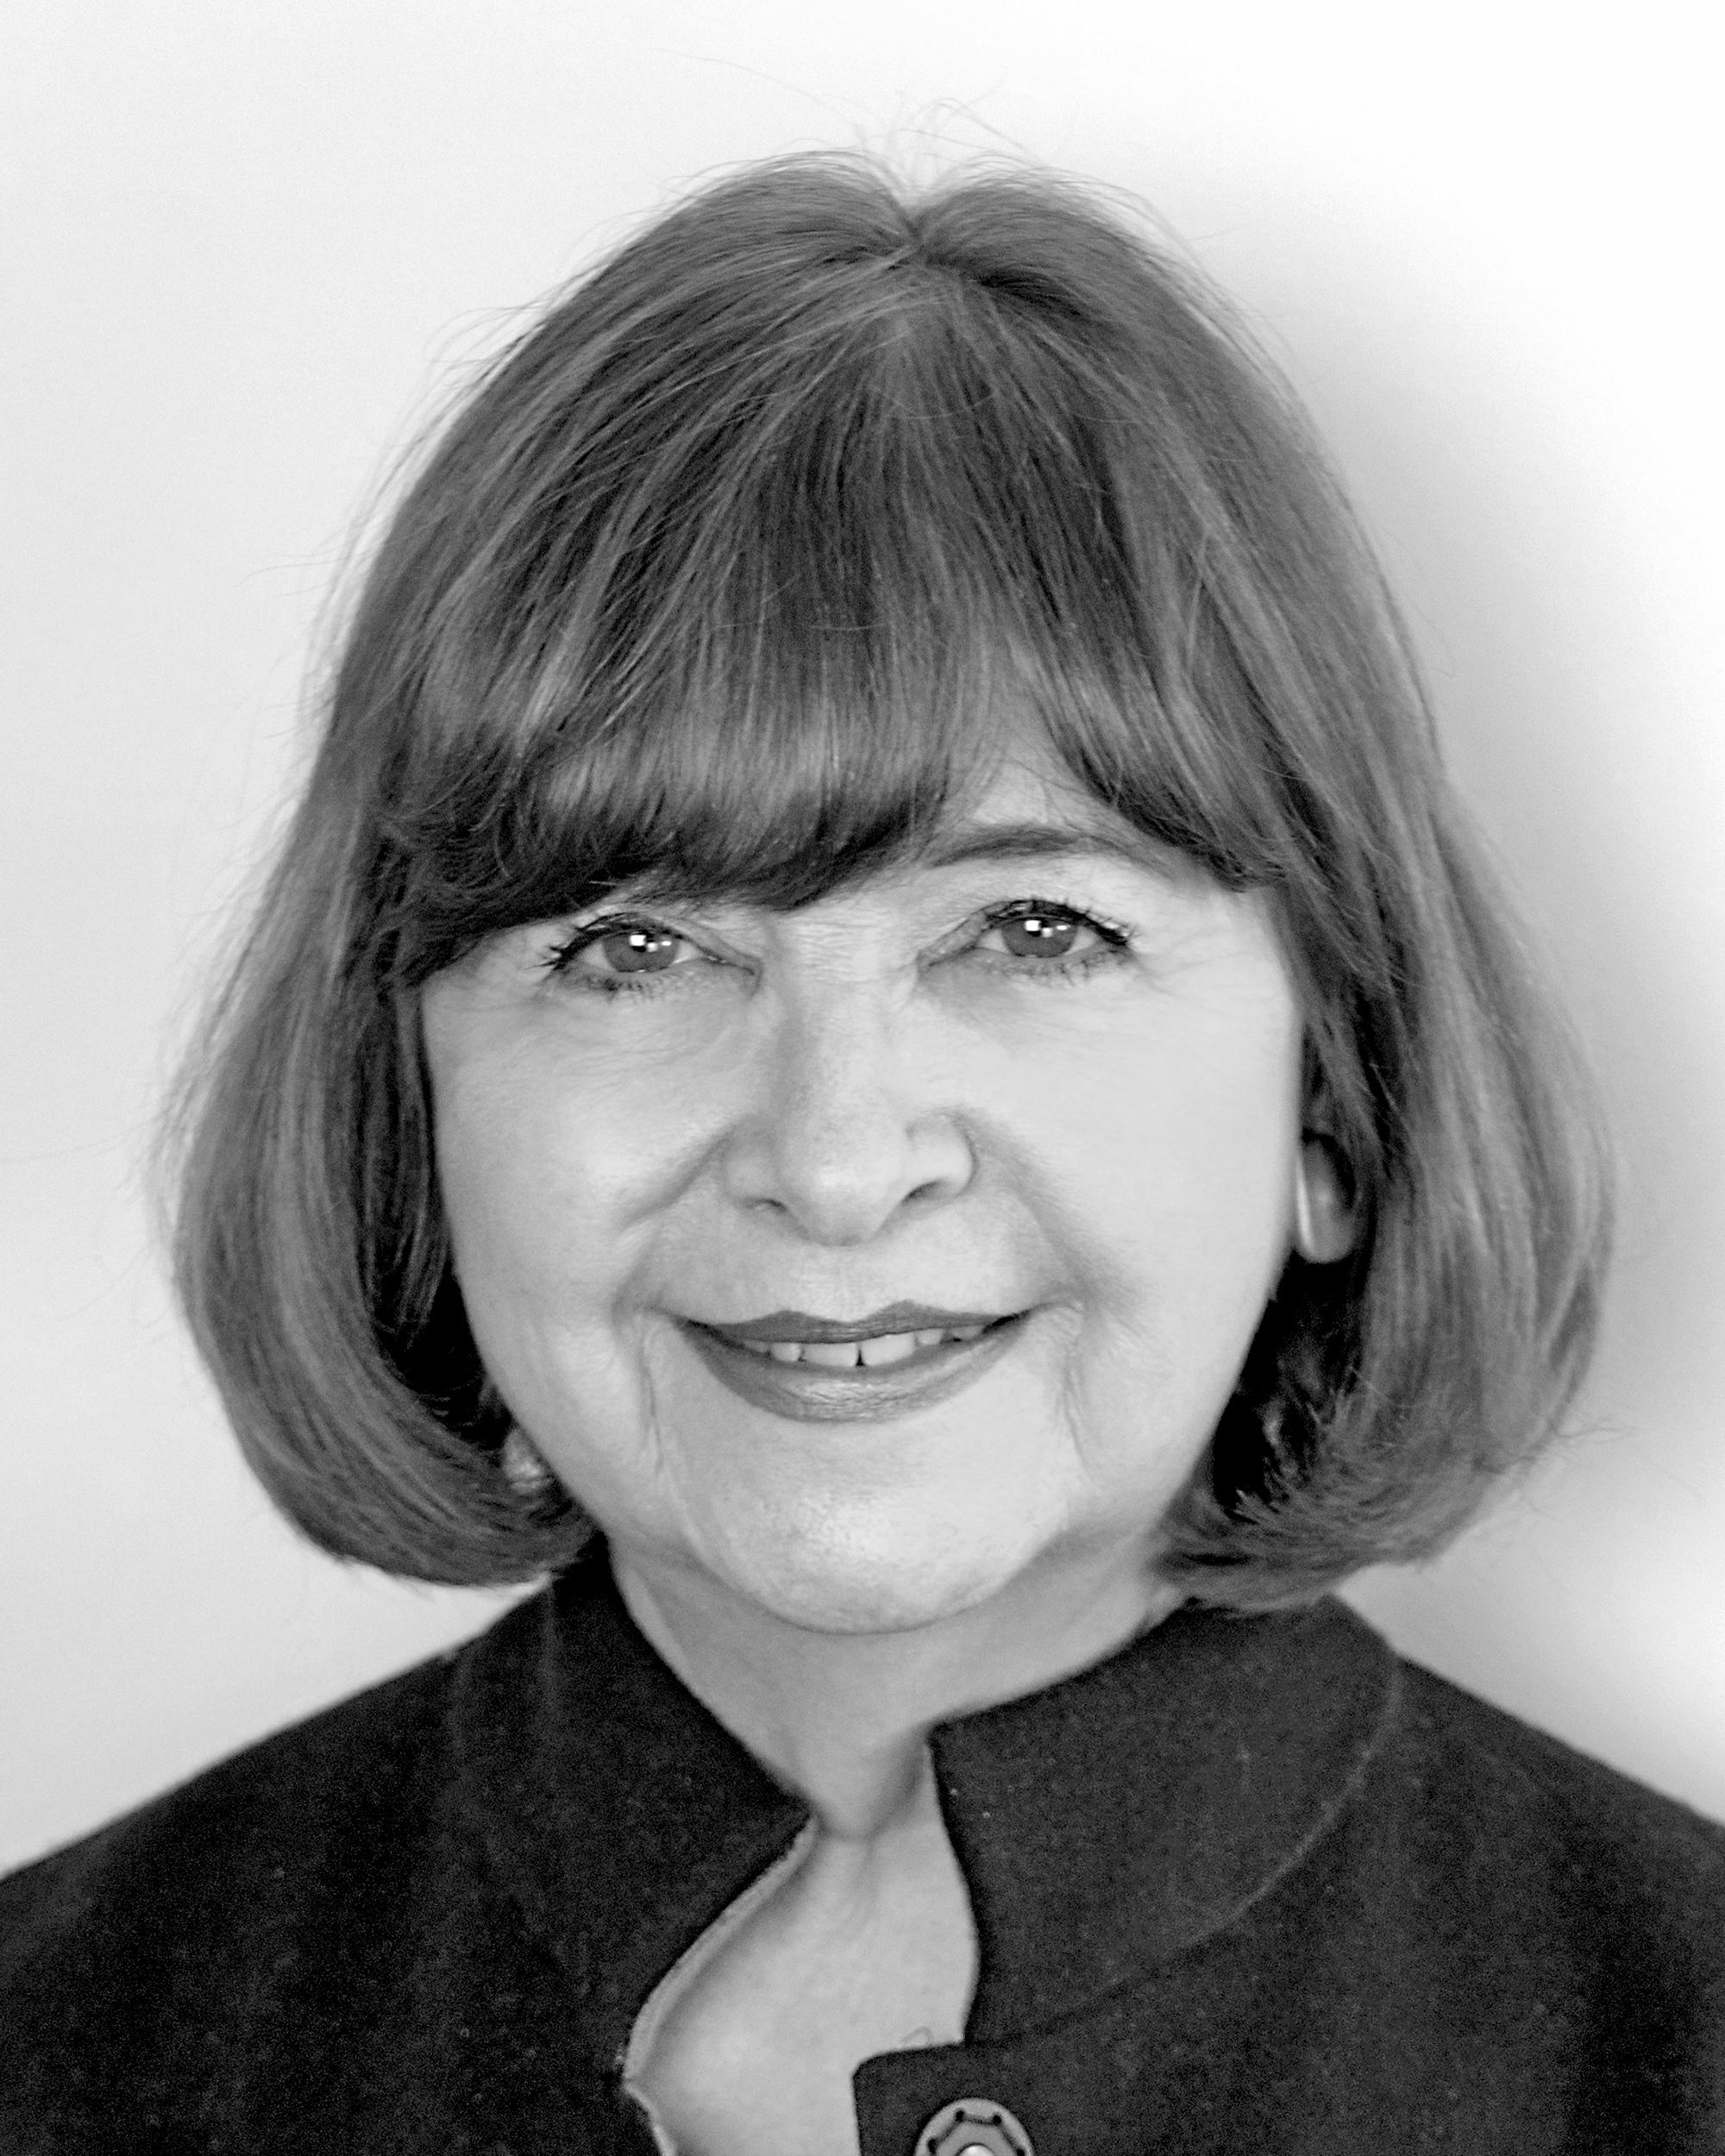 Headshot of Lorraine Bell